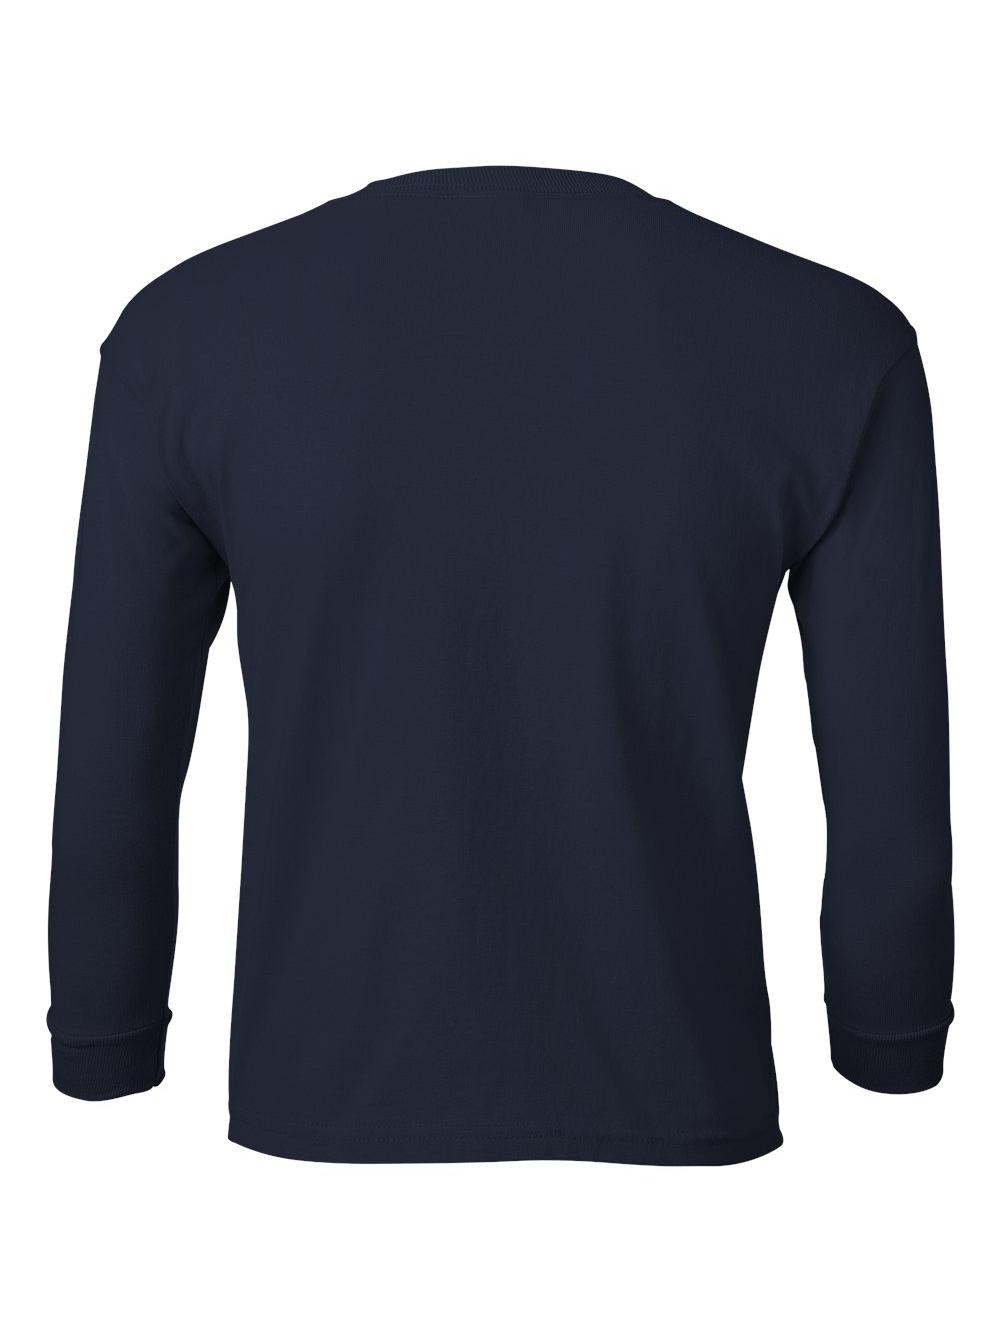 Gildan-Ultra-Cotton-Youth-Long-Sleeve-T-Shirt-2400B thumbnail 25